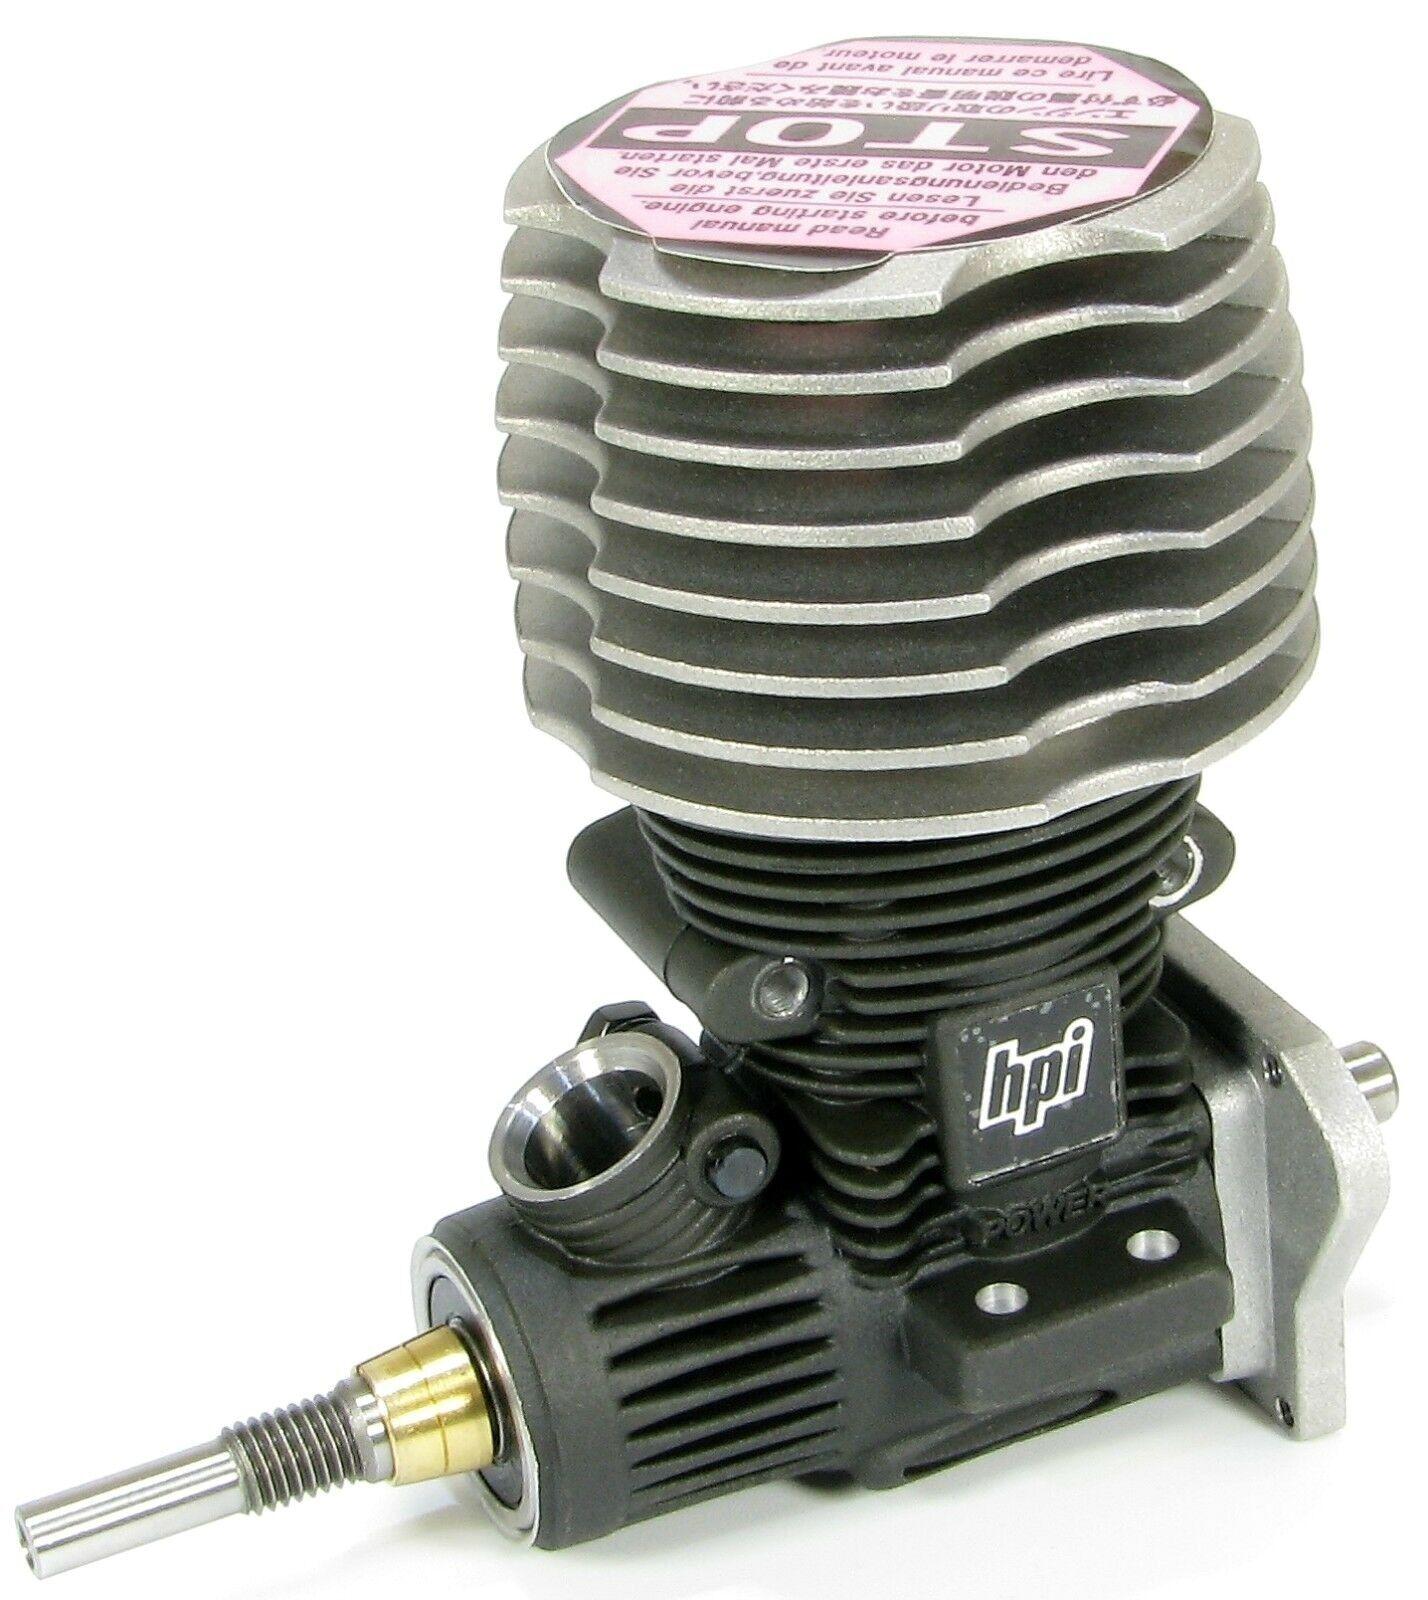 HPI Bullet Firestorm Nitro Star G3.0 Engine Set (11 parts inc. )